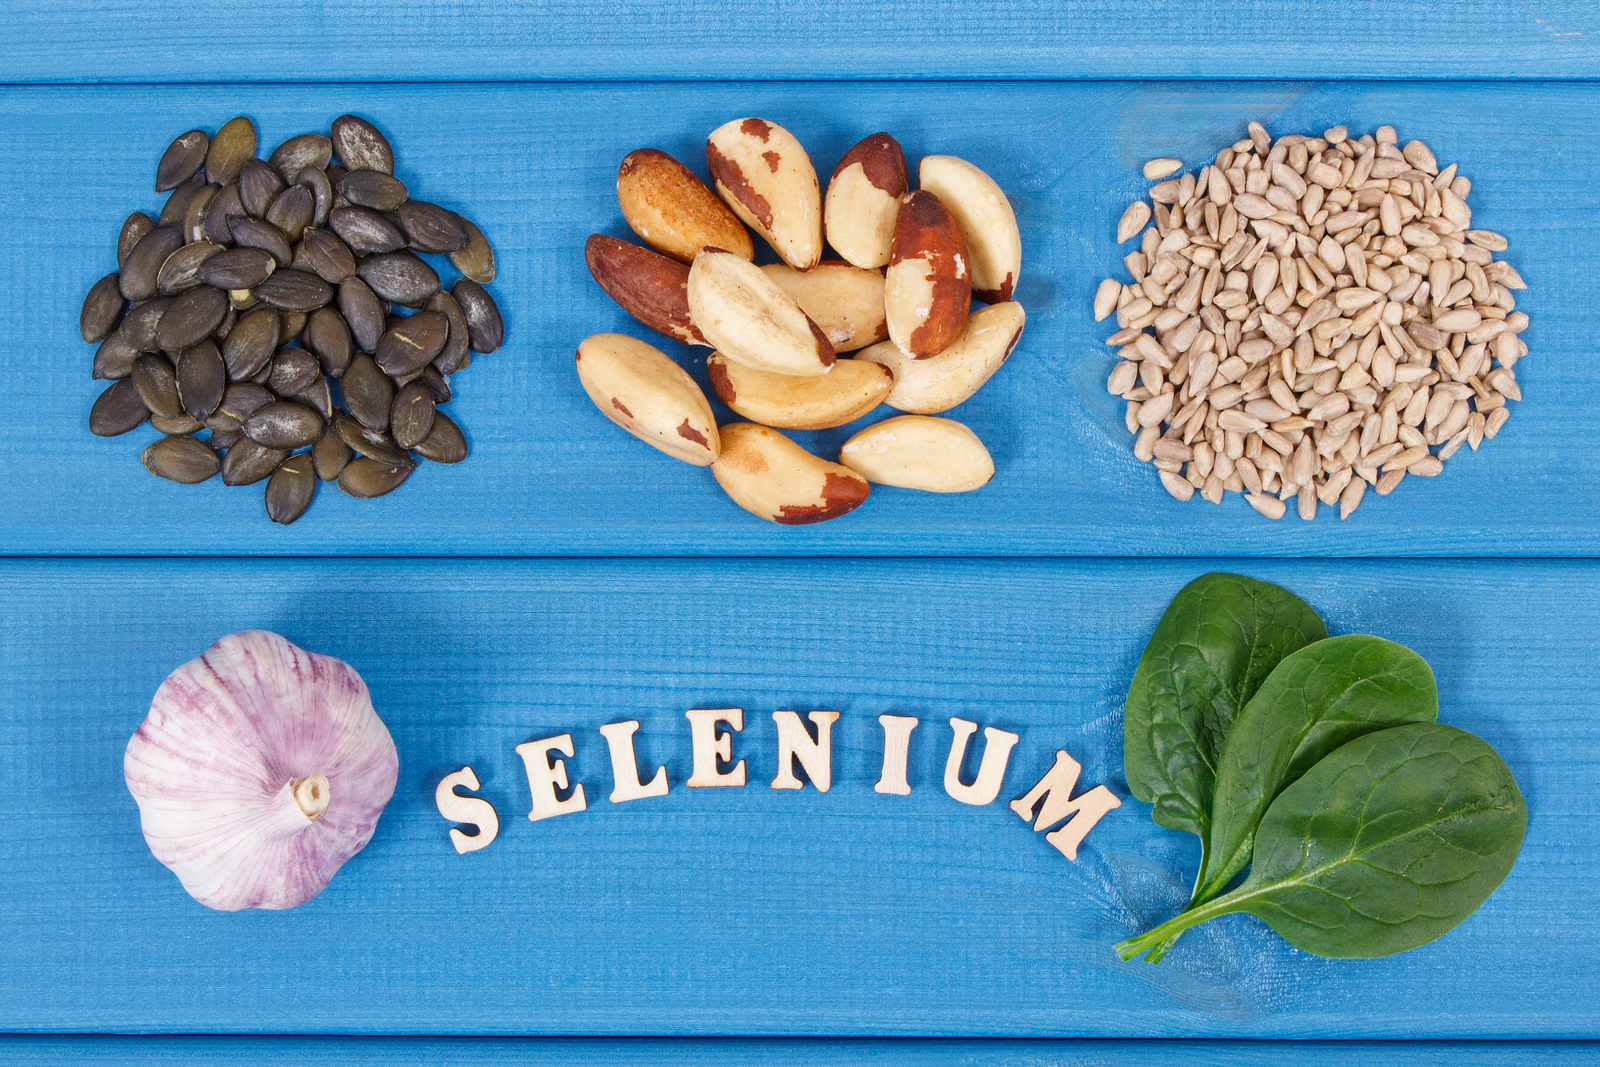 selenium genova high low treatment meaning interpretation